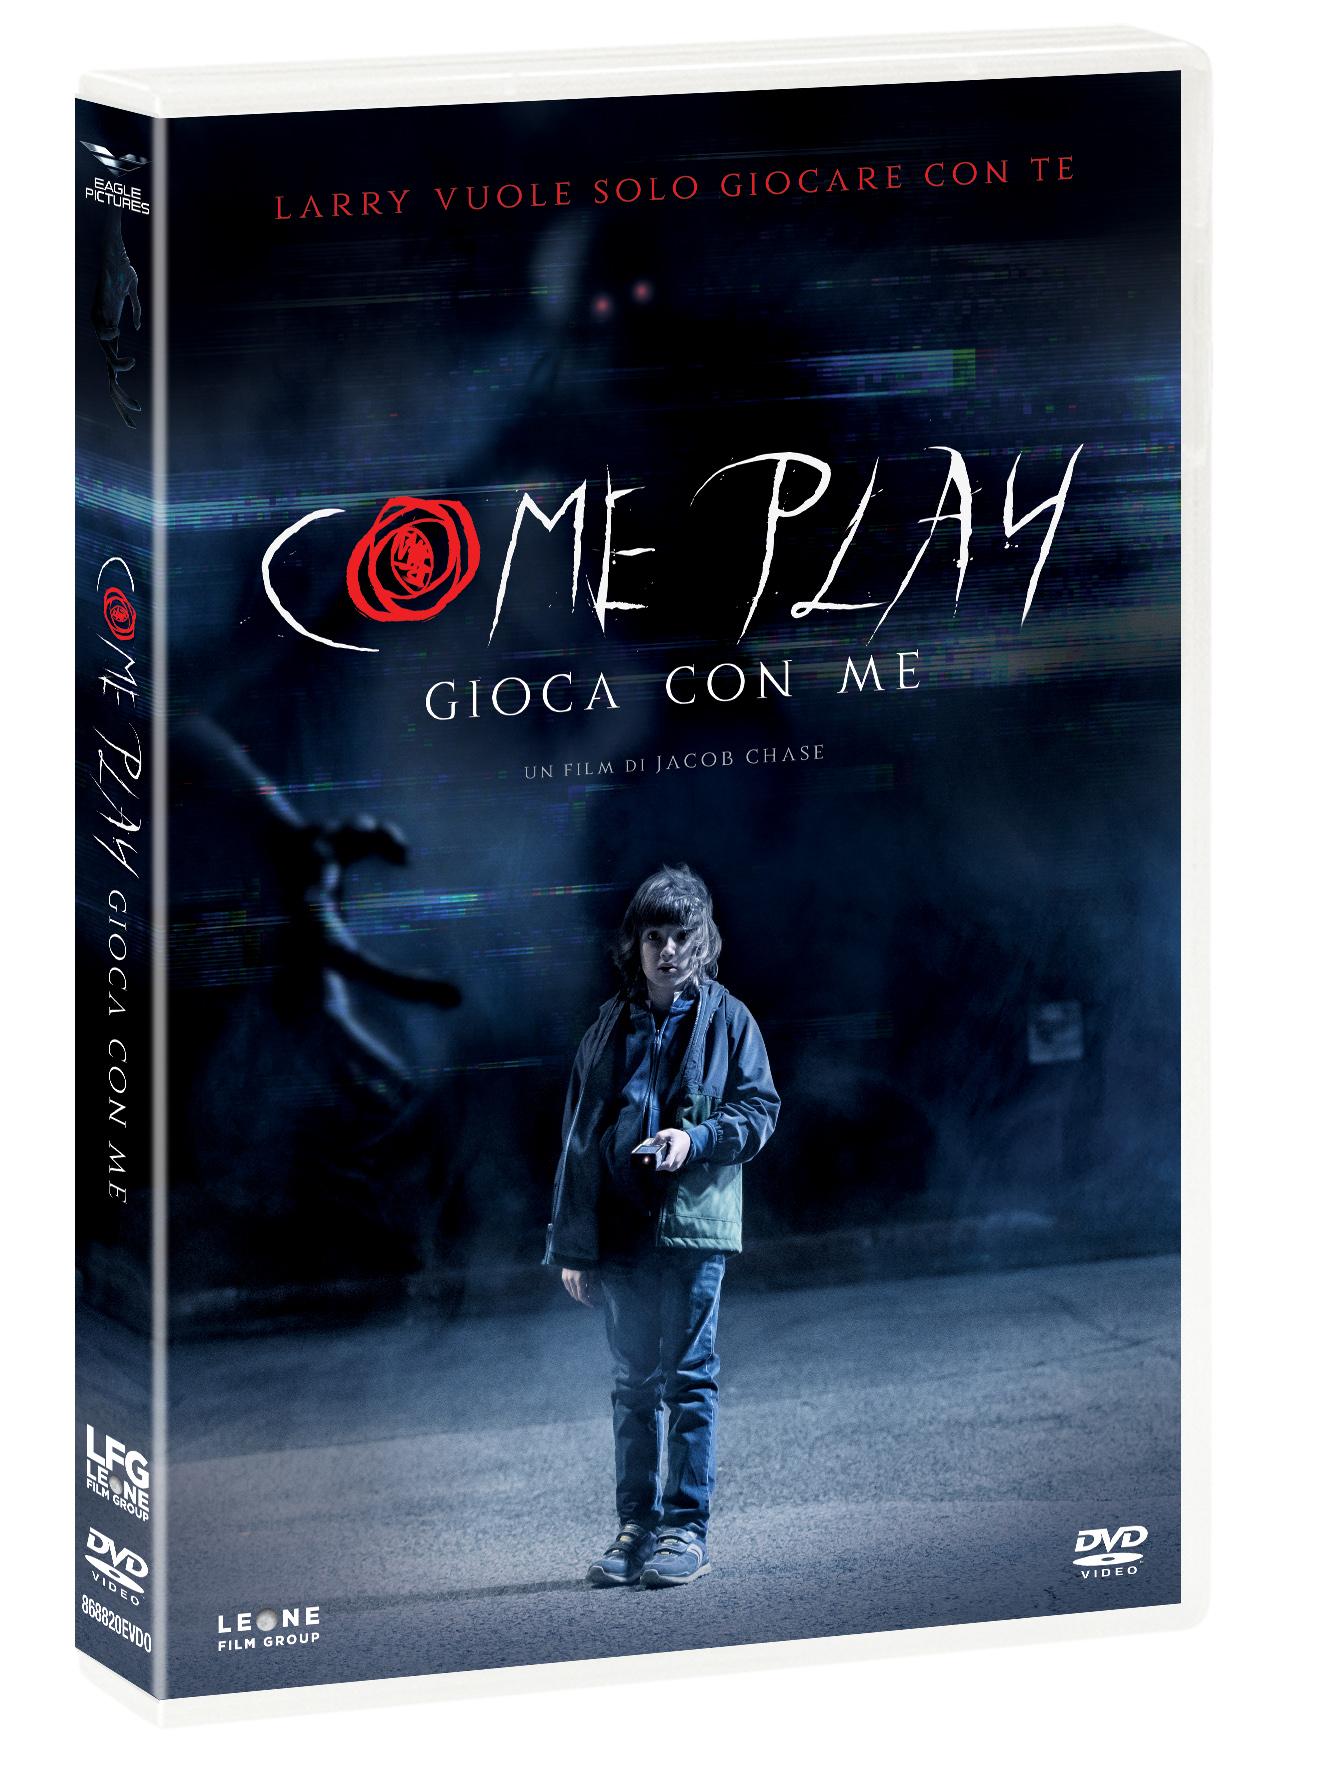 COME PLAY - GIOCA CON ME (DVD)